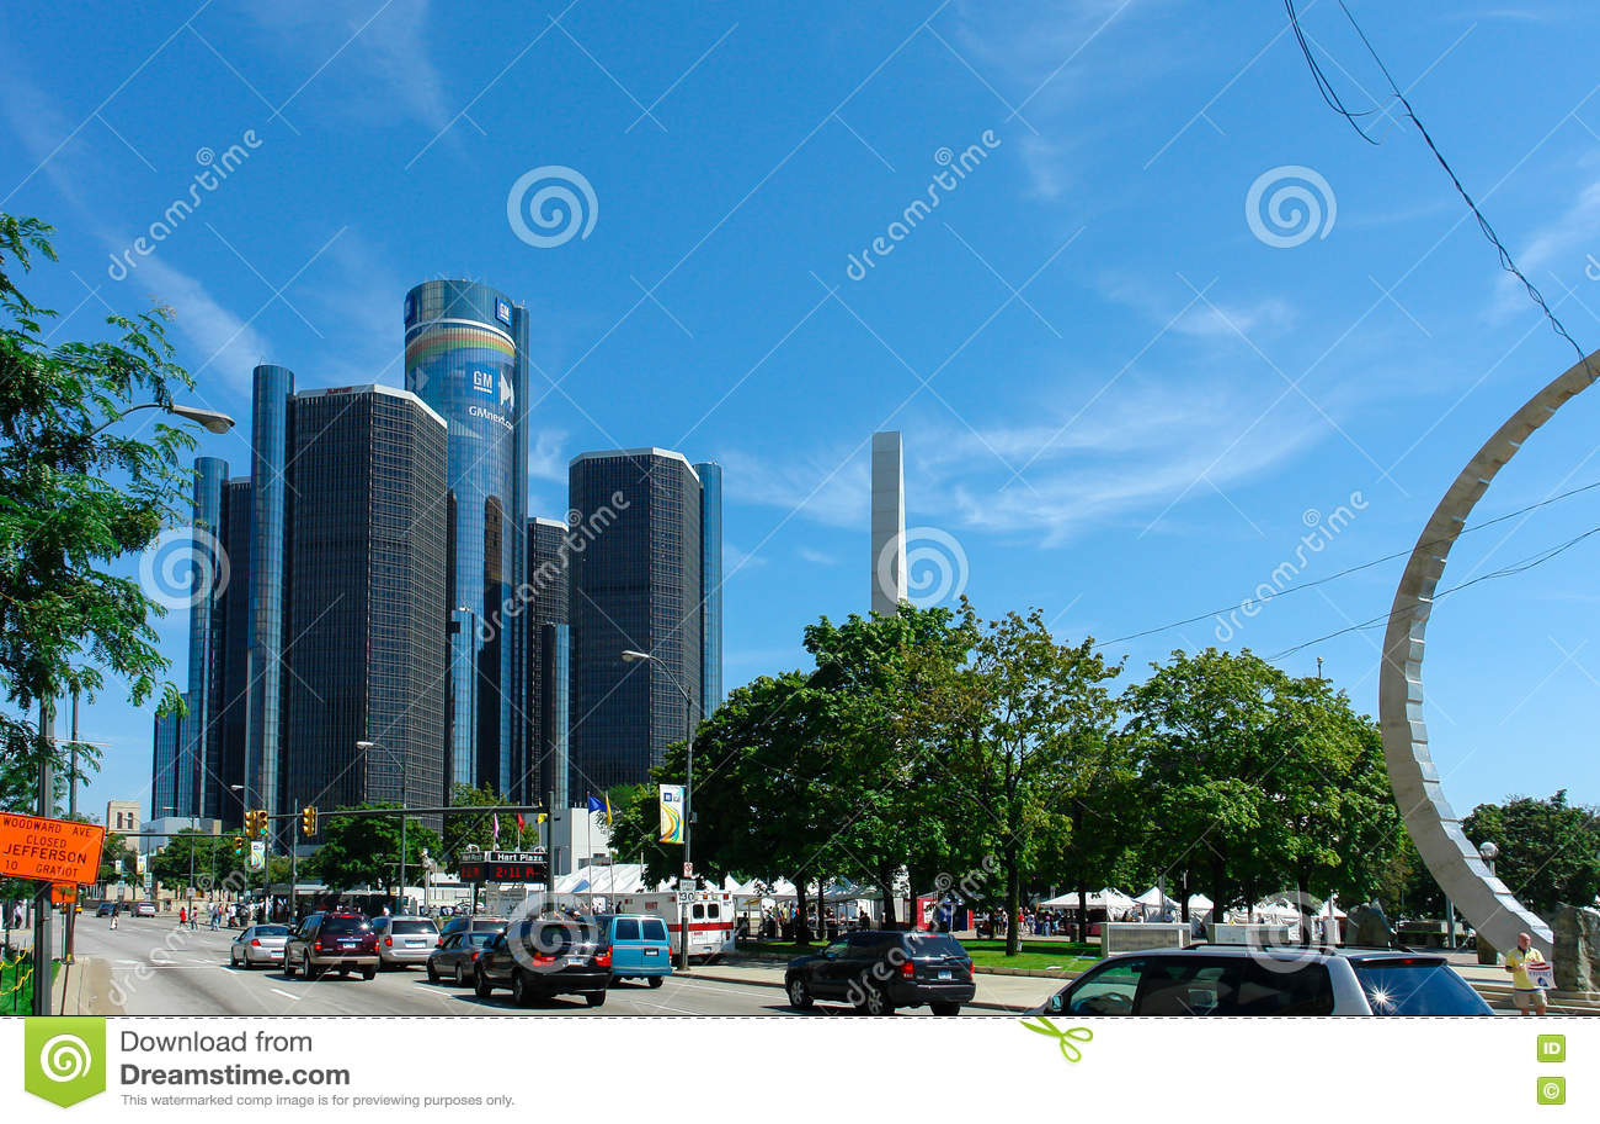 GM Renaissance Center, Rencen in Detroit, Michigan, USA